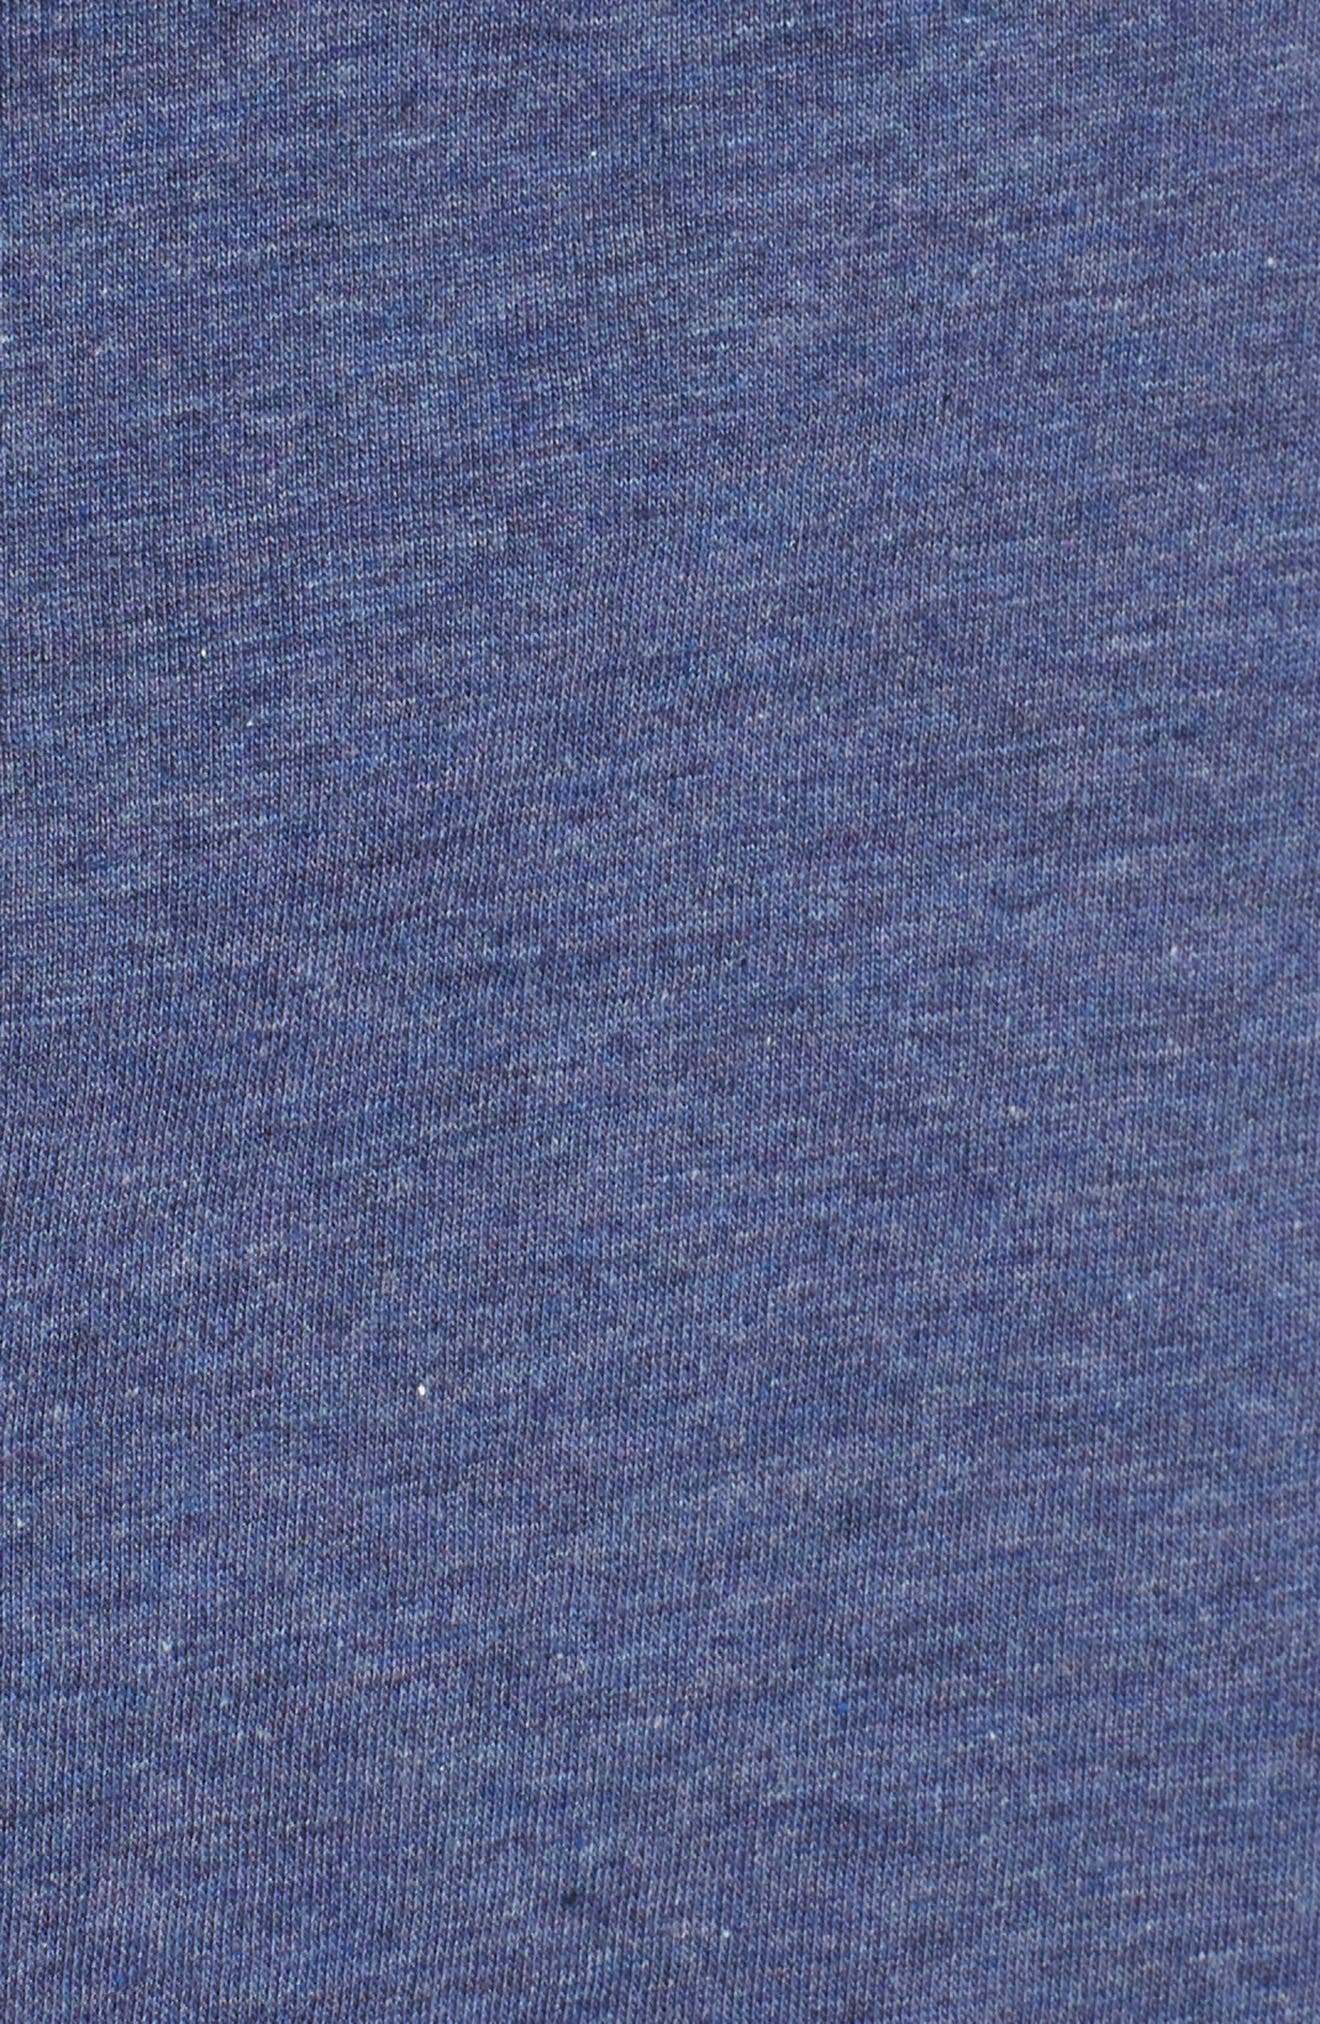 3-Pack Knit Boxers,                             Alternate thumbnail 6, color,                             Navy/ Medium Blue/ Cargo